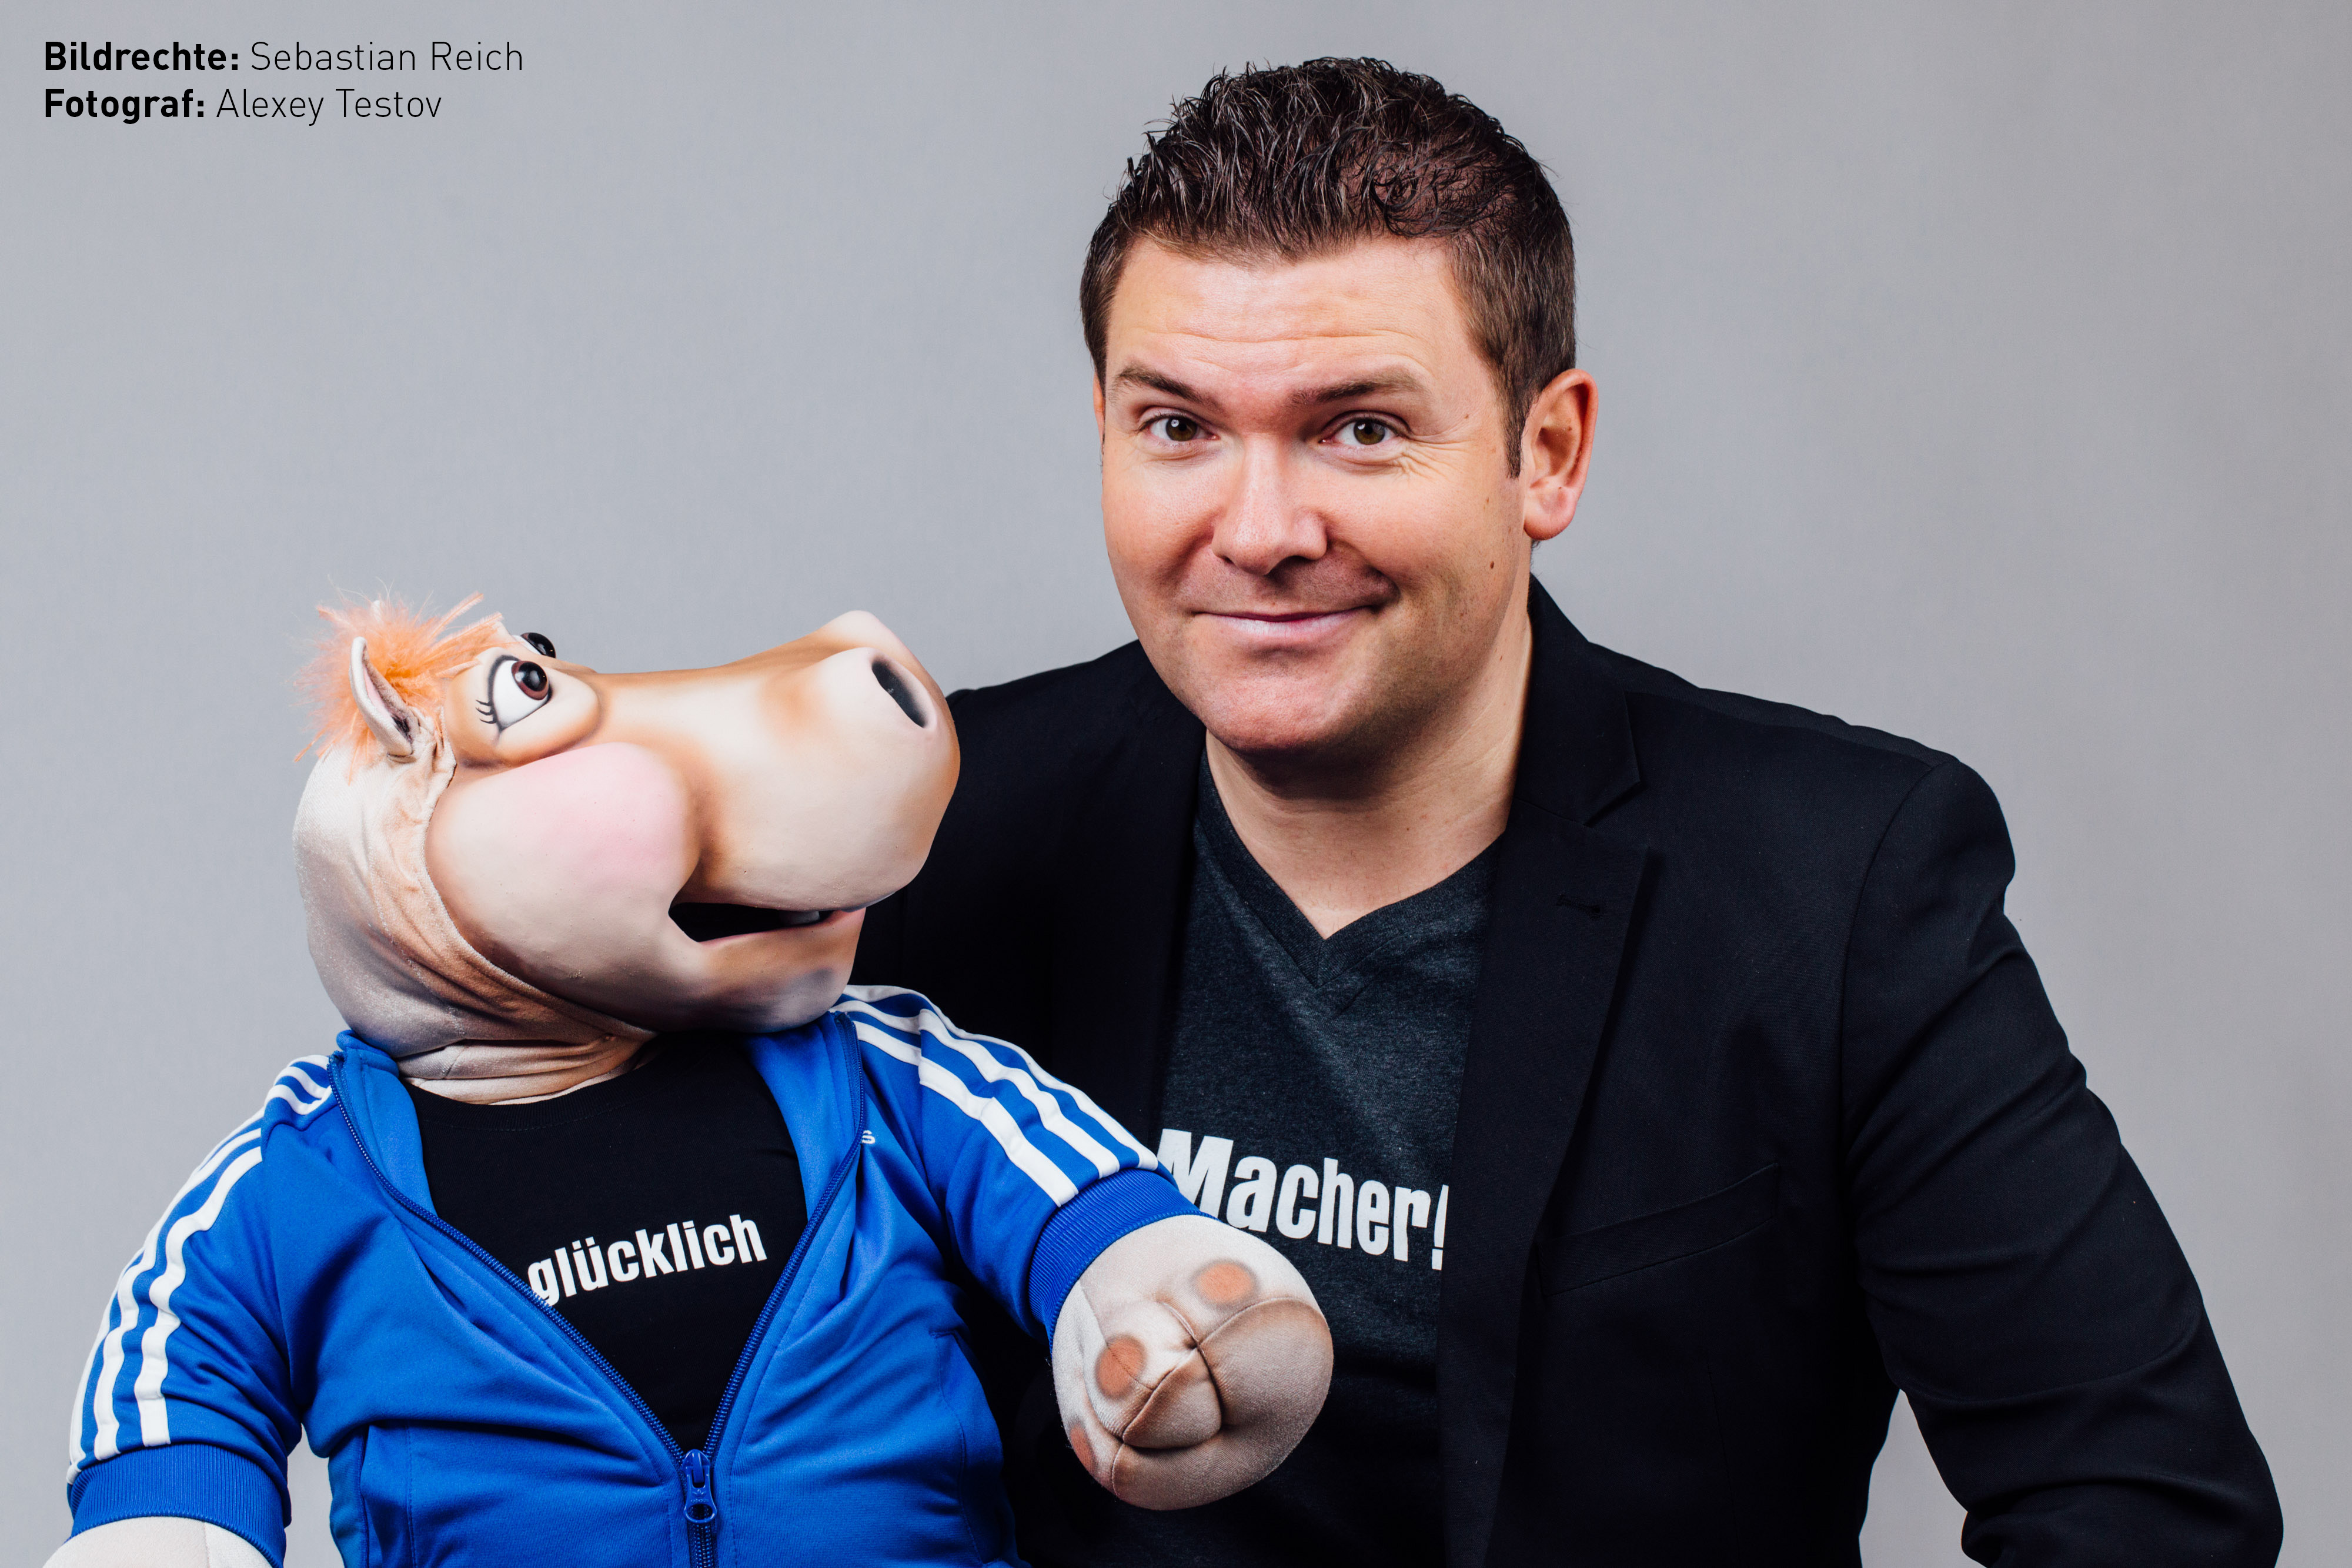 SebastianReichundAmanda-┬®AlexeyTestov025_-Hinweise